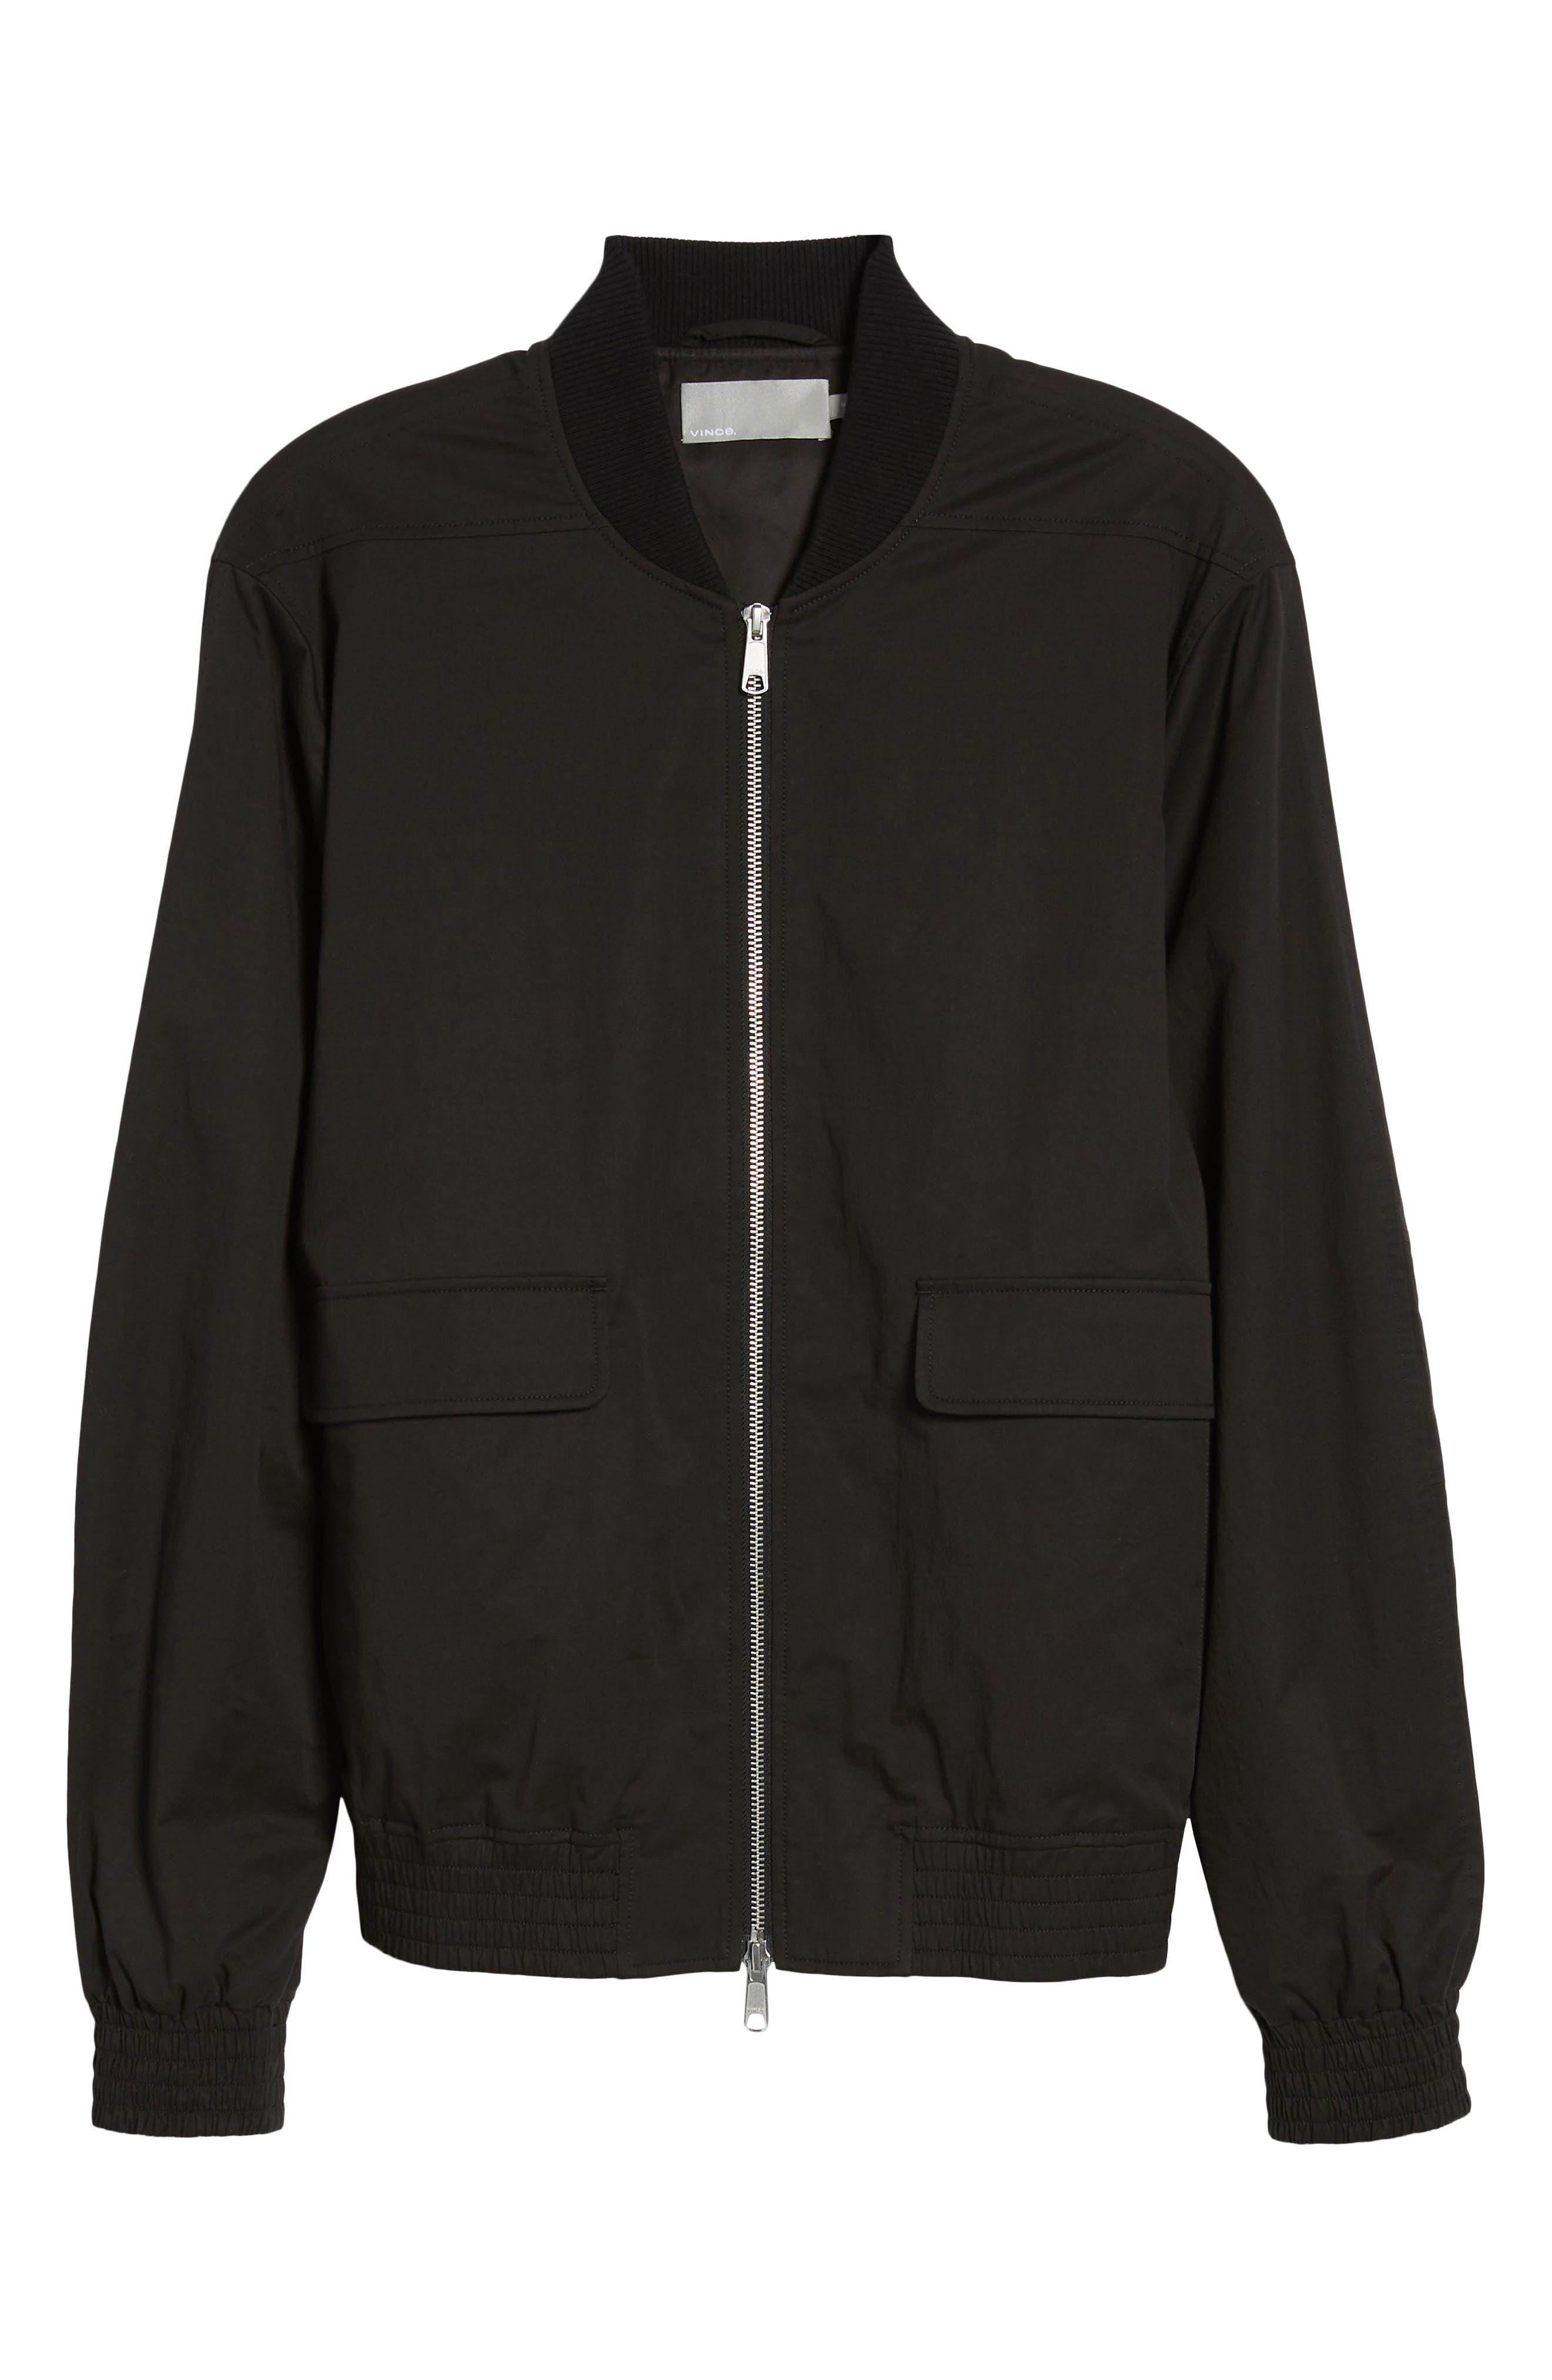 Regular Fit Bomber Jacket,                             Alternate thumbnail 5, color,                             BLACK